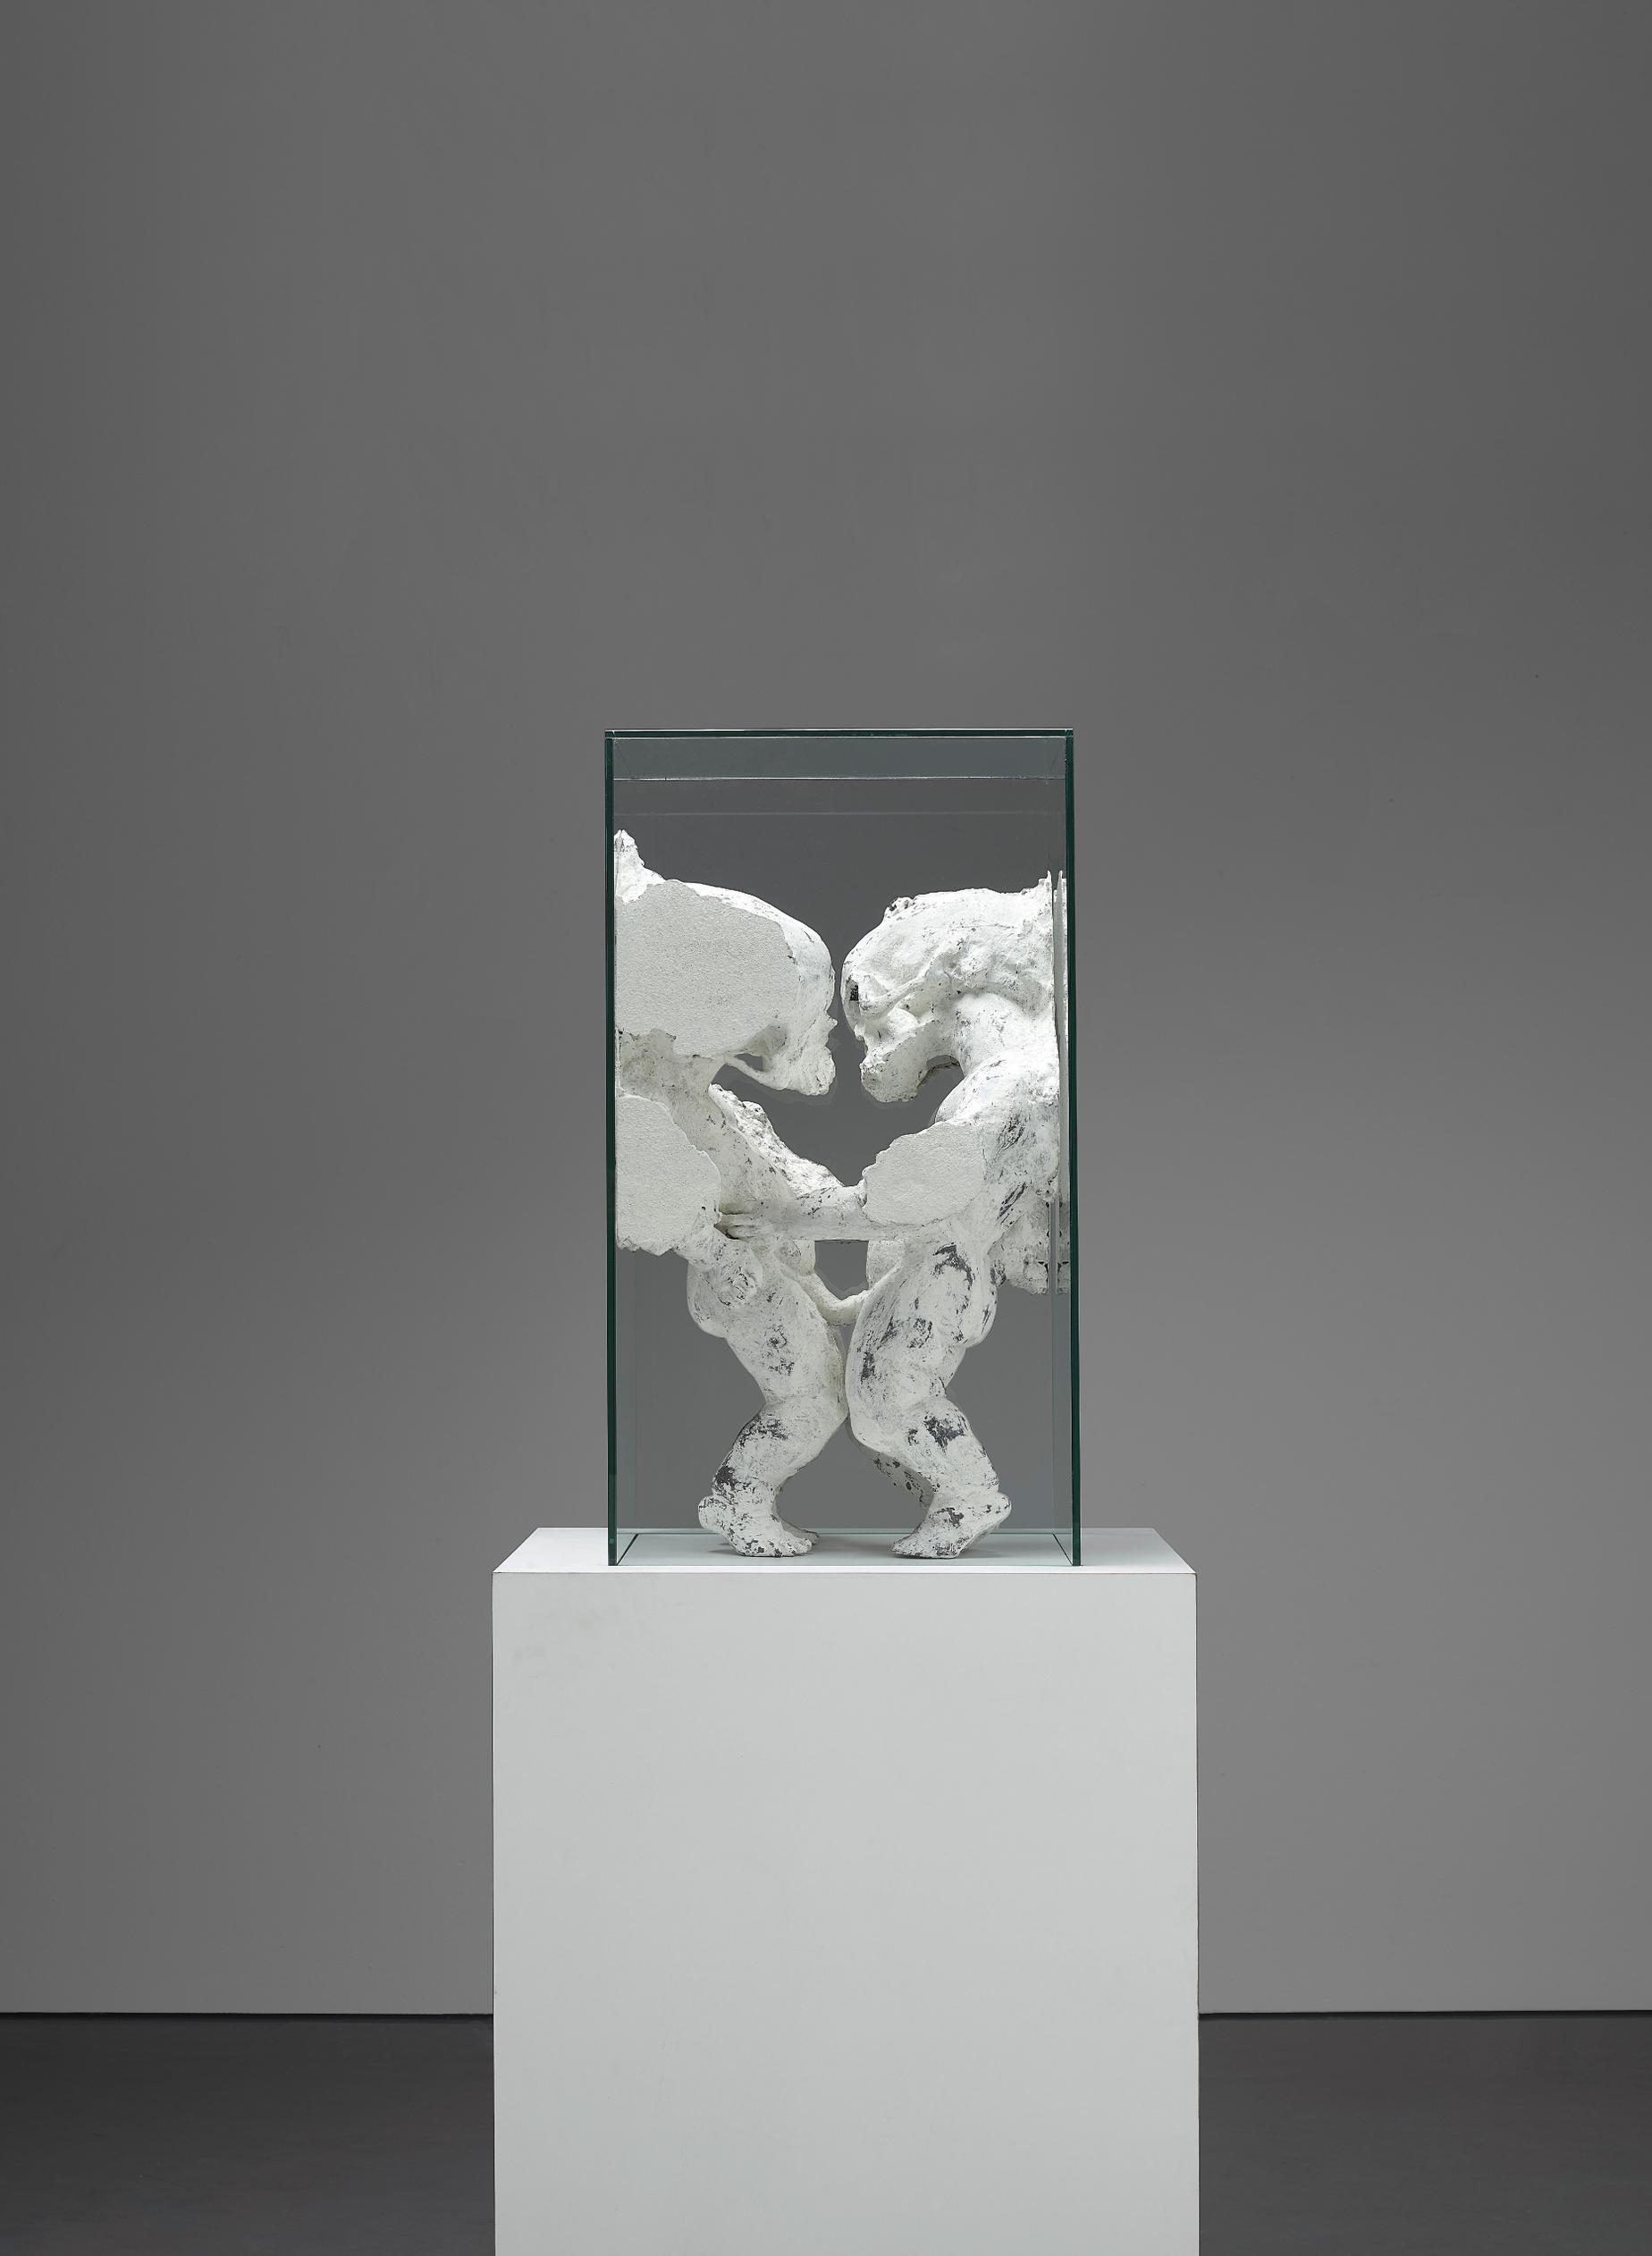 Thomas Lerooy-The Kiss-2009